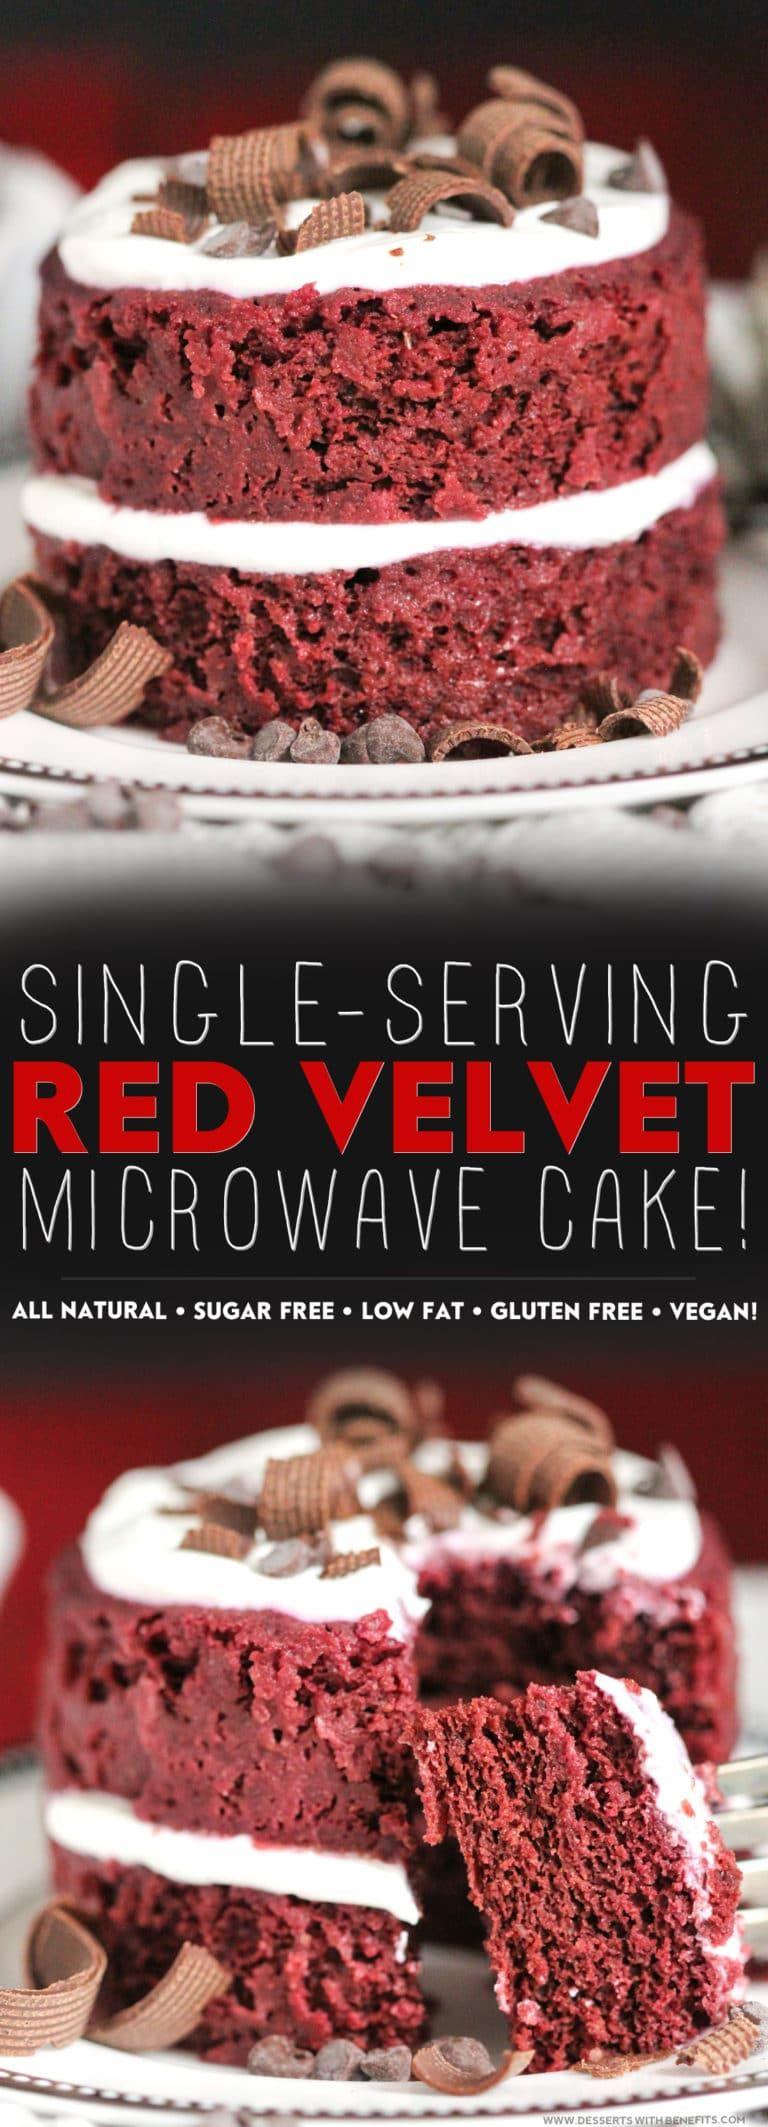 Healthy Single-Serving Red Velvet Microwave Cake | Recipe ...